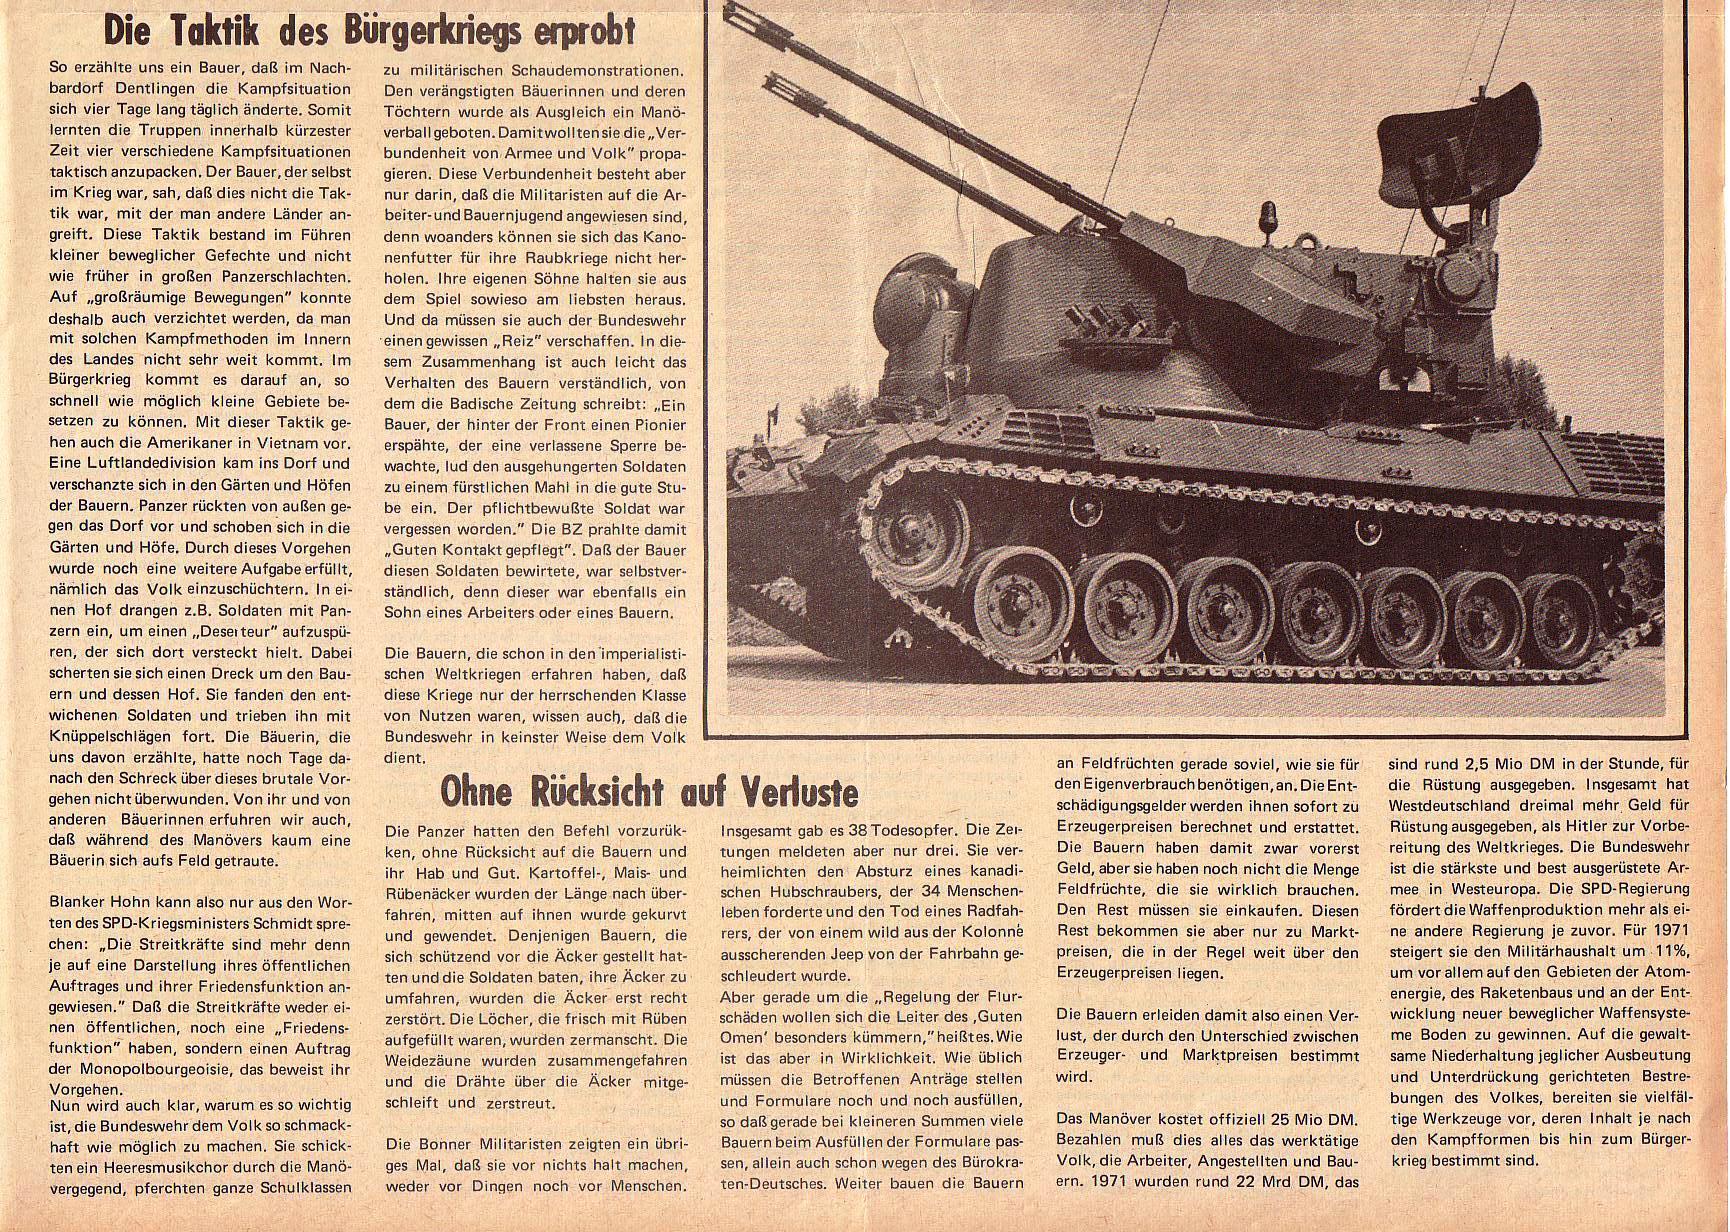 Roter Morgen, 5. Jg., 6. Dezember 1971, Nr. 15, Seite 3b